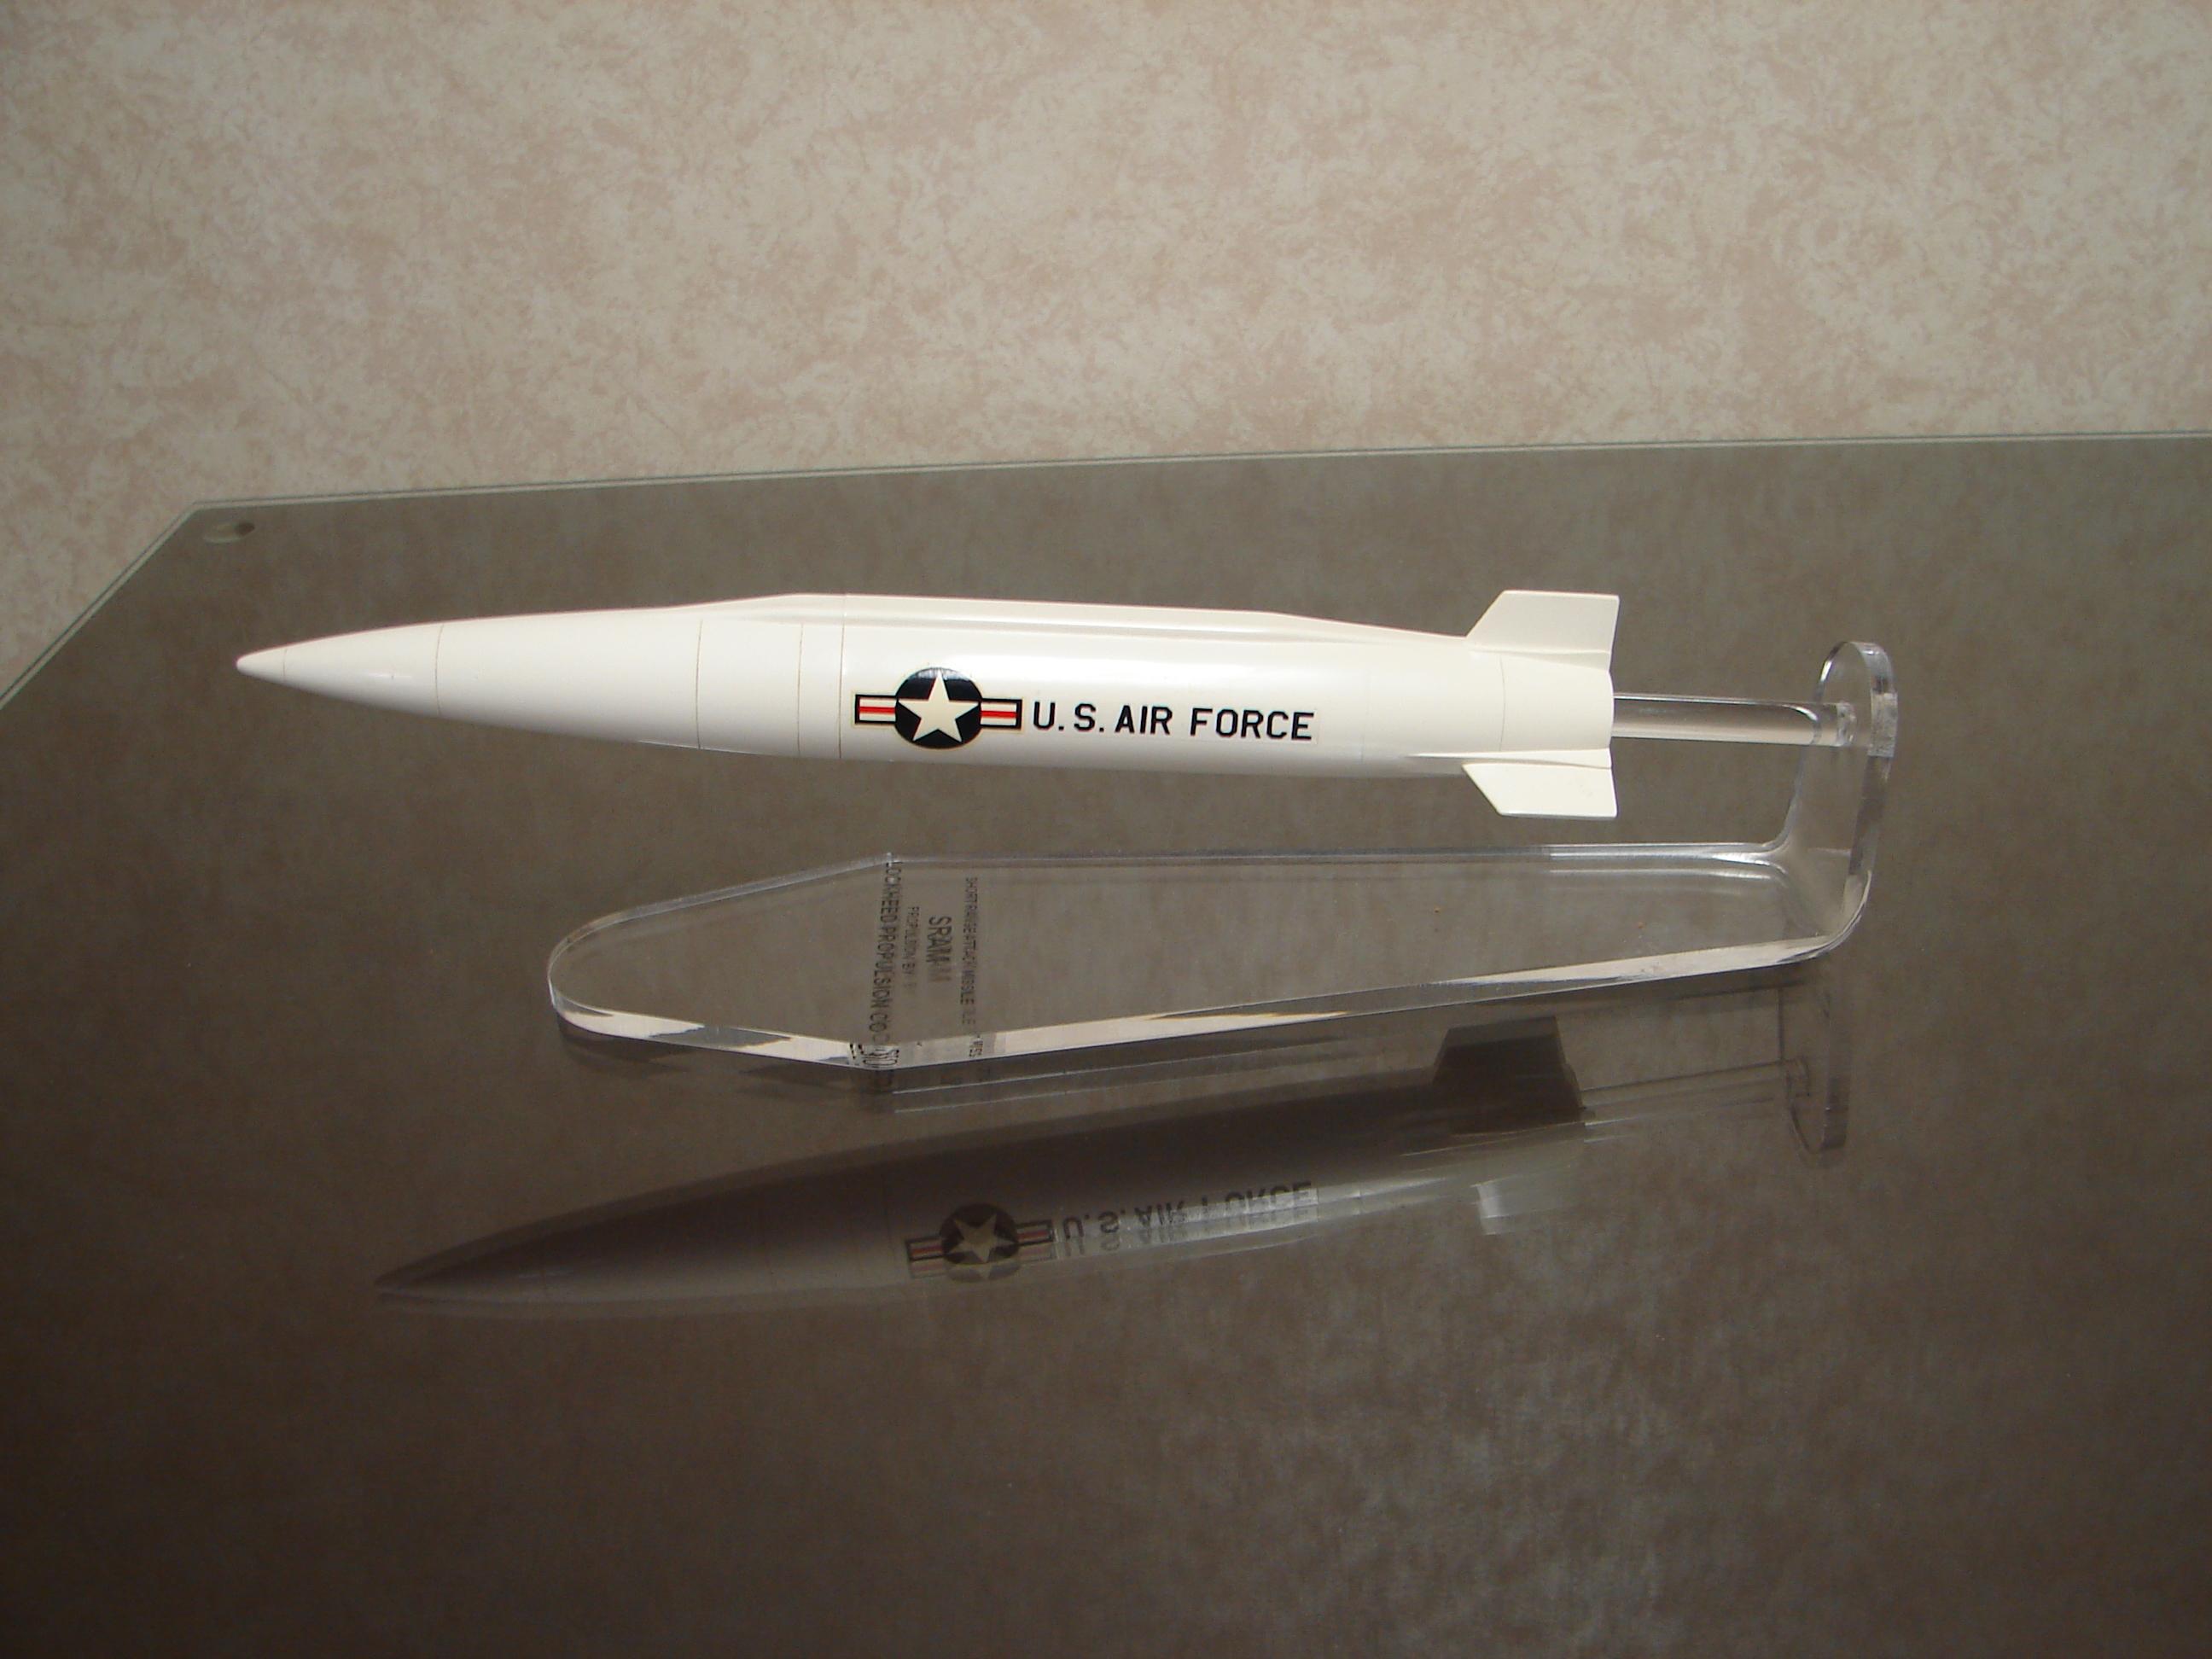 Boeing SRAM missile